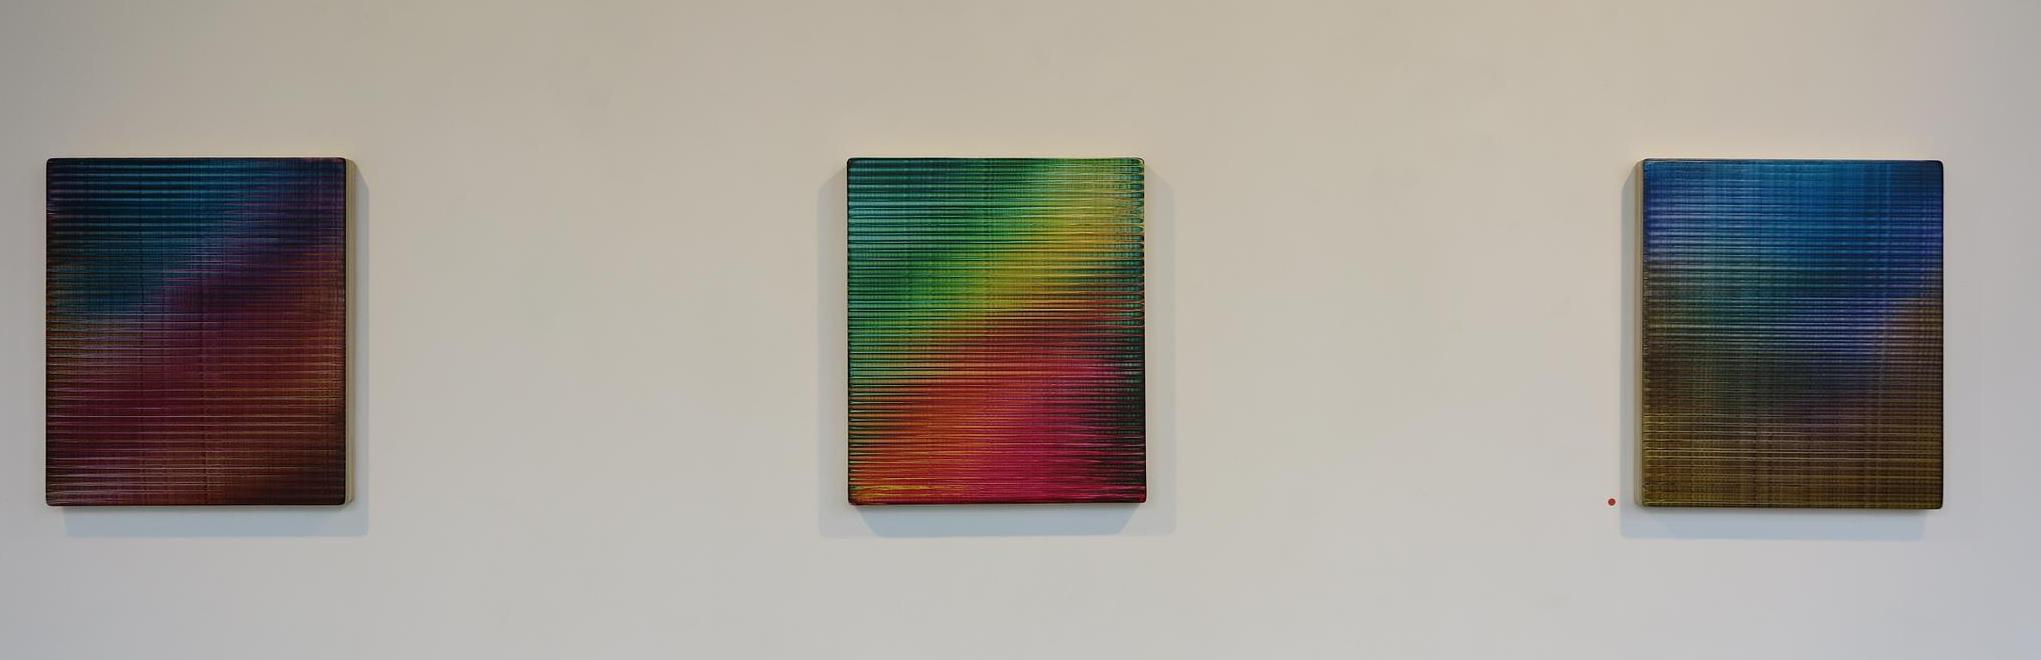 Rob Bouwman - C&H artspce